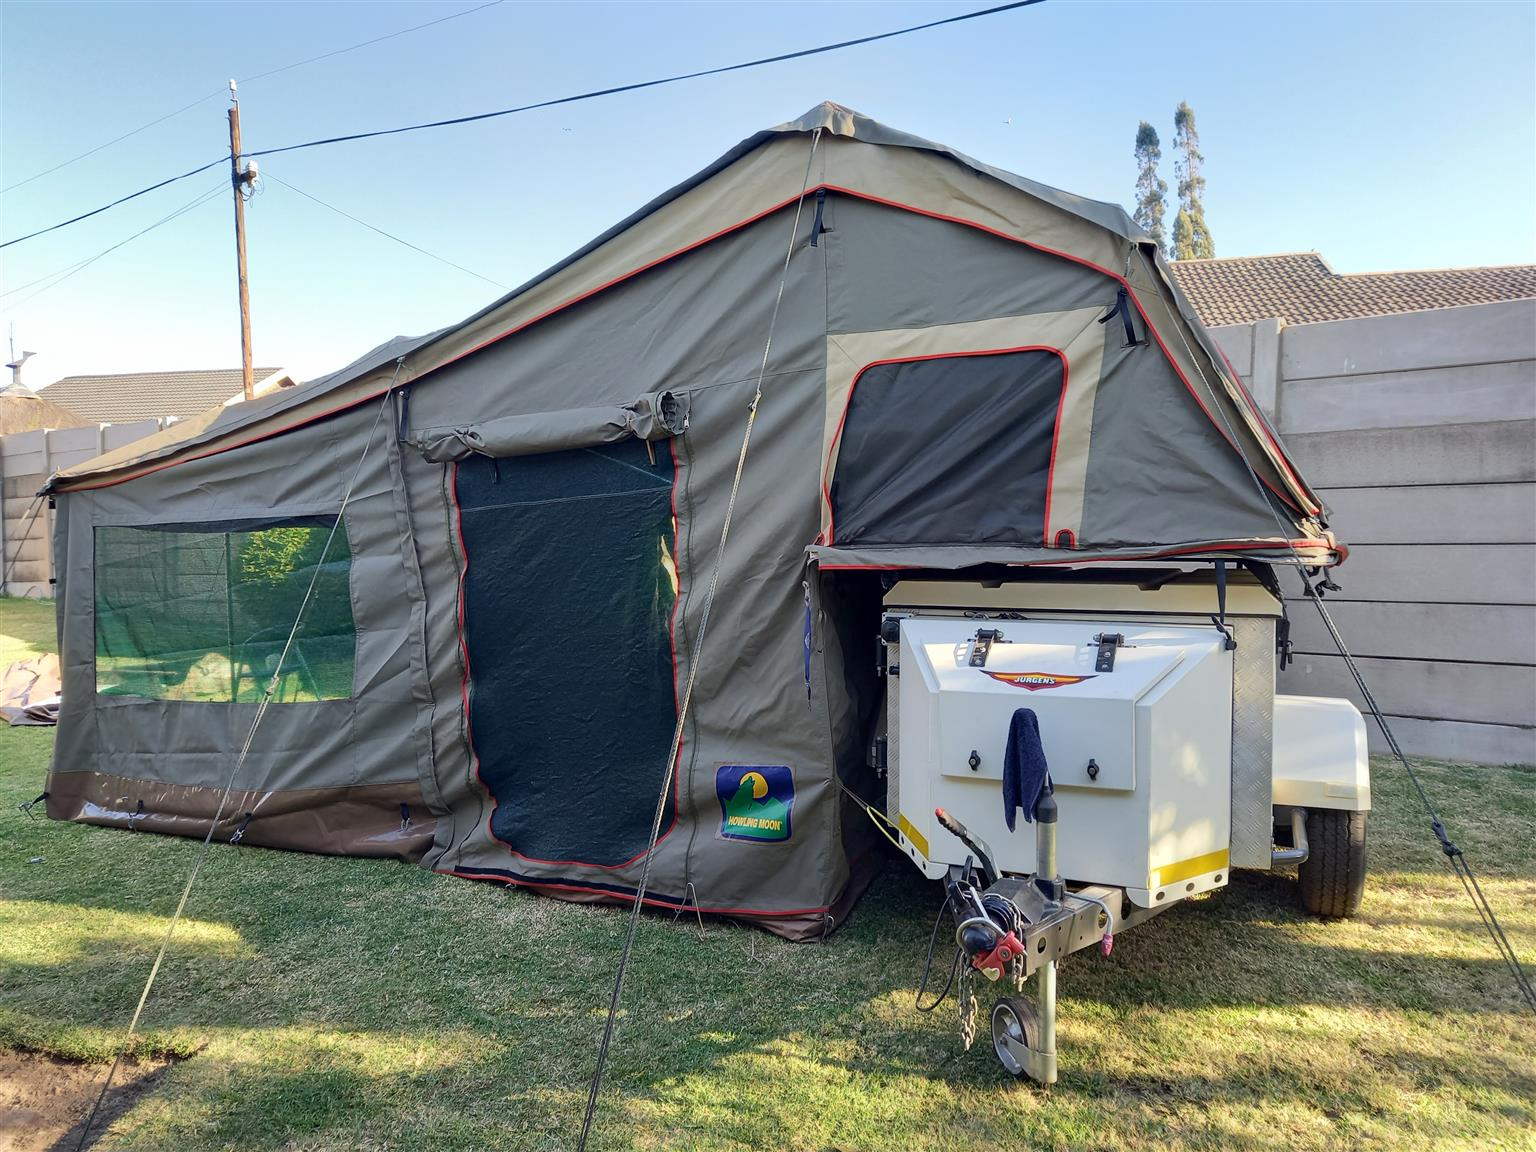 Jurgens xt65B camp trailer plus cash to swop for Sherpa TinyTiny